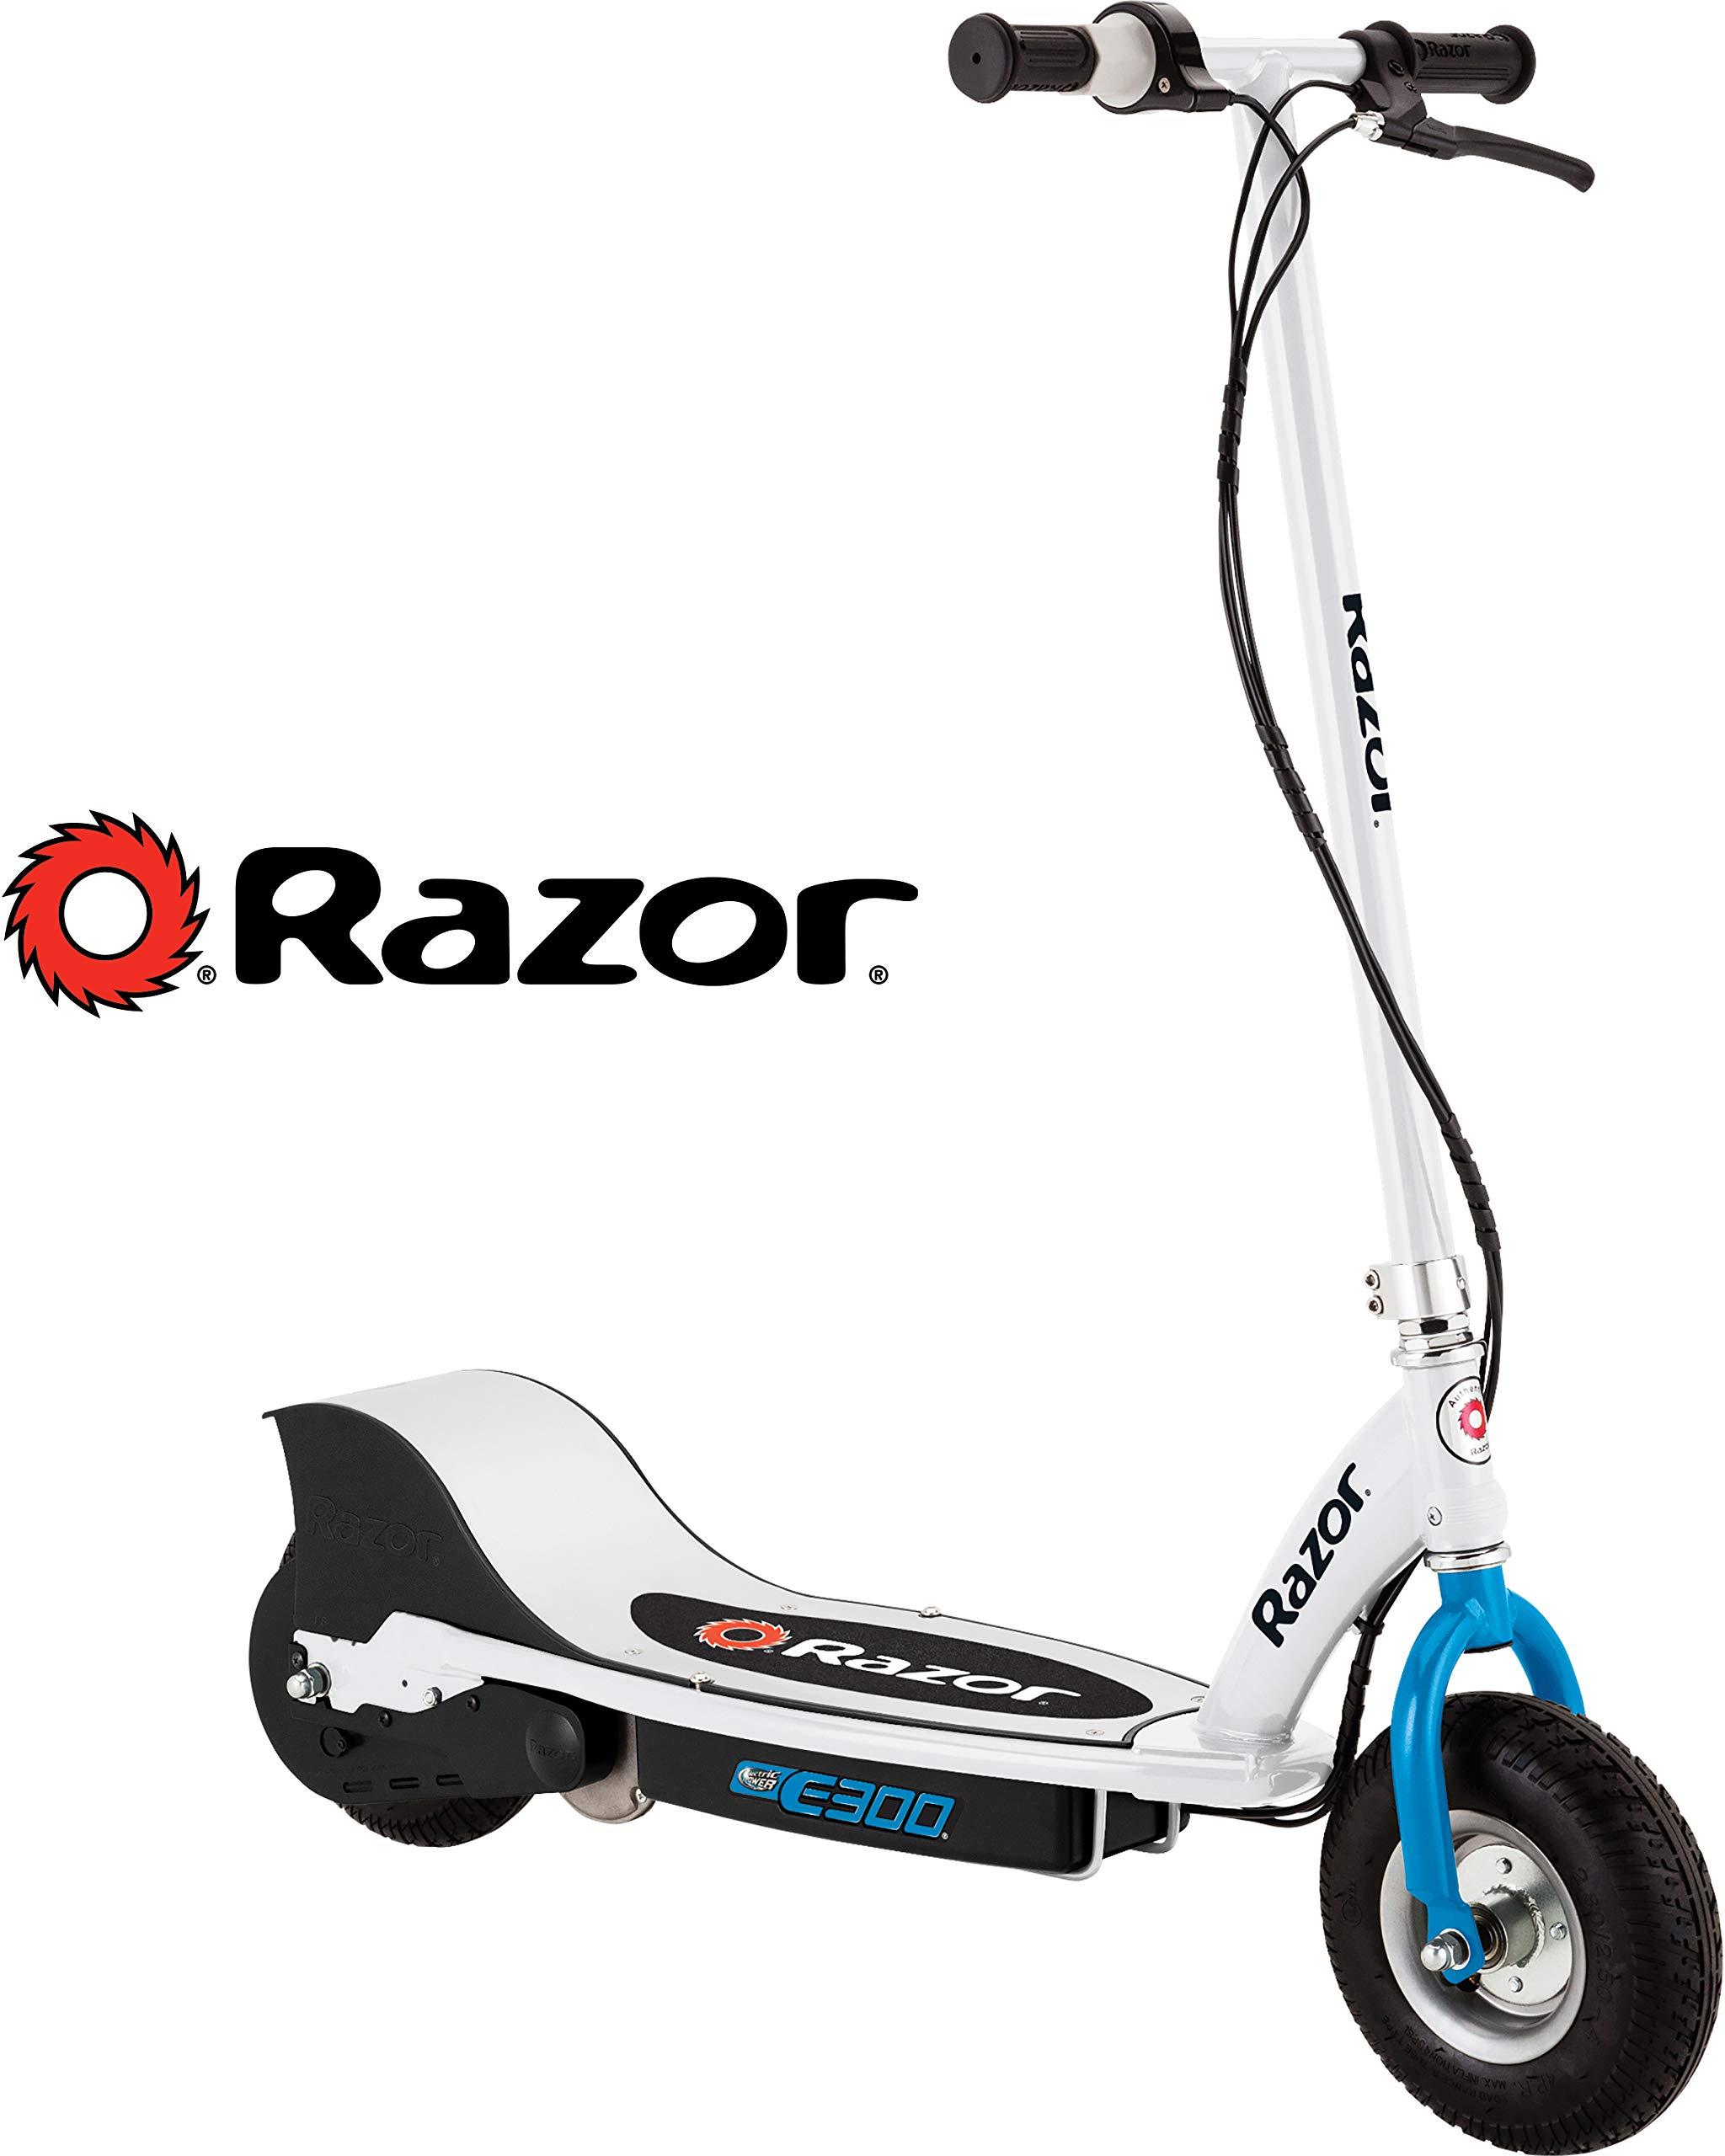 Razor E300 Teen Rechargeable 24 Volt Electric 250 Watt Motorized Scooter. White by Razor